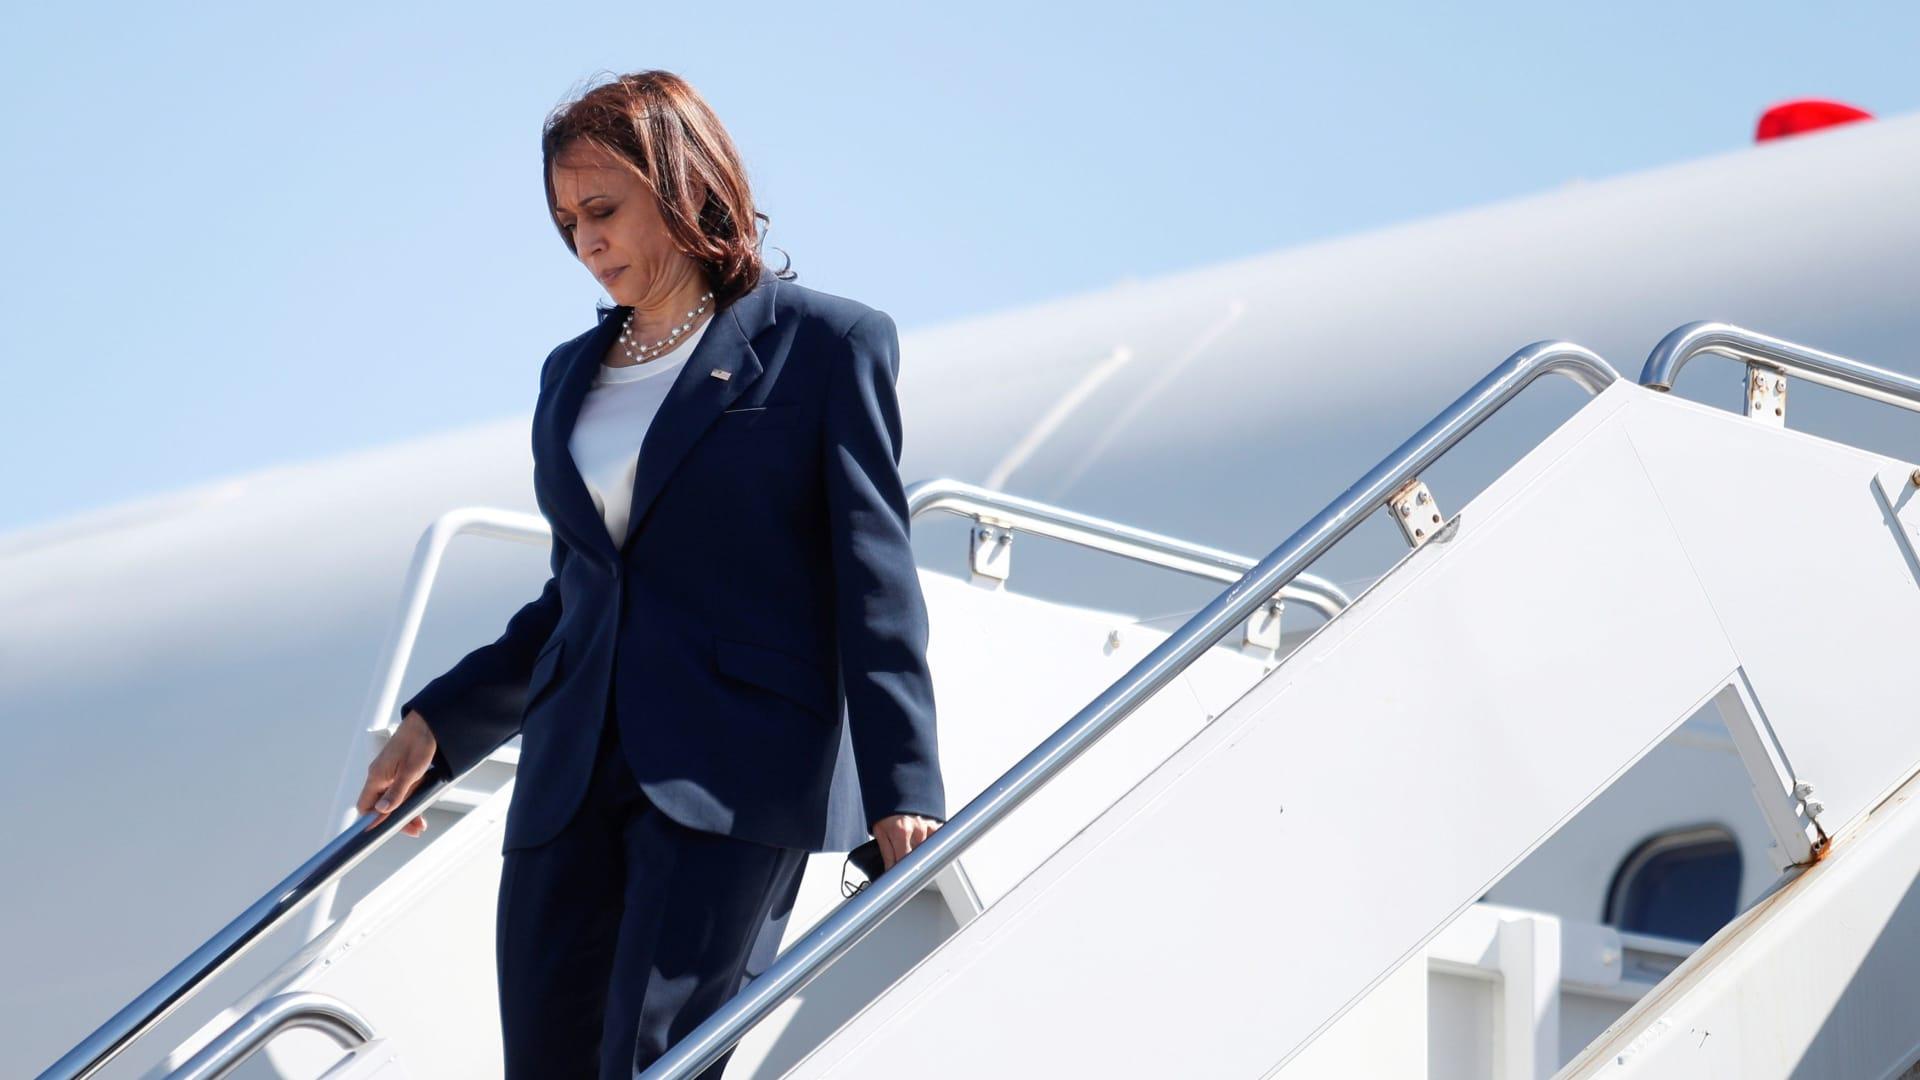 U.S. Vice President Kamala Harris descends from Air Force Two at Newport News/Williamsburg International Airport, in Newport News, Virginia, U.S., September 10, 2021.